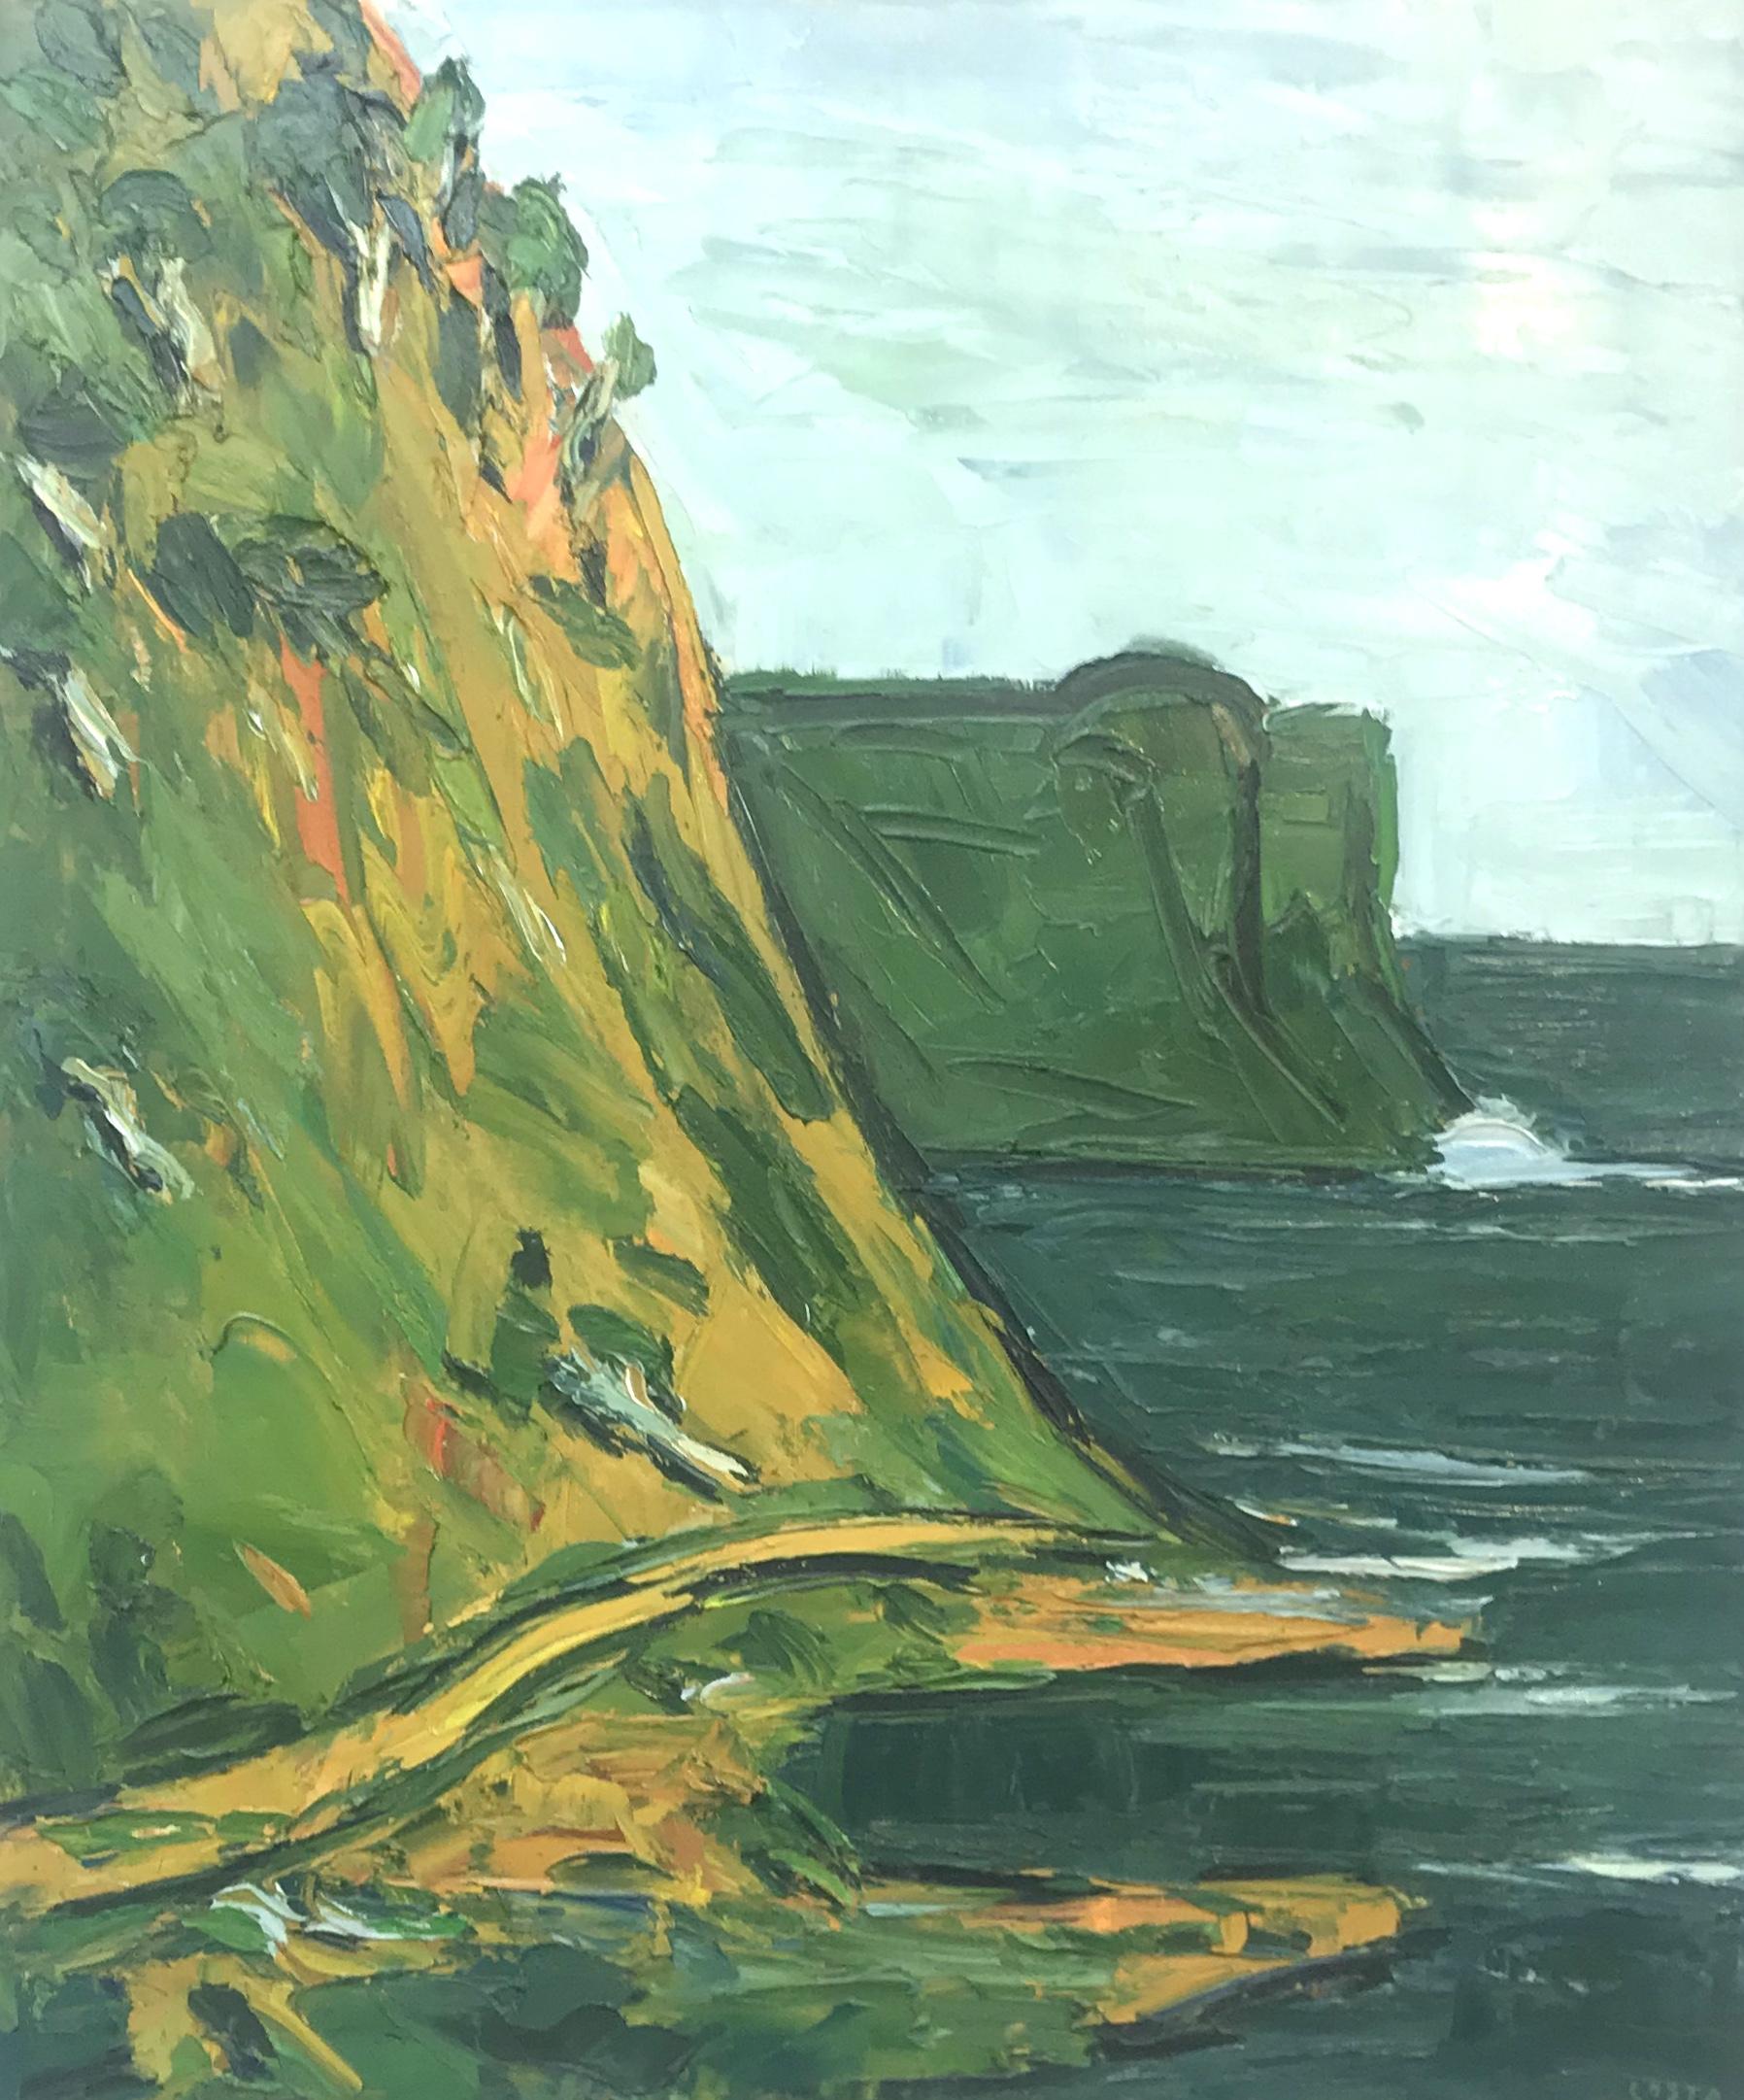 Art Atrium, Contemporary art, Australian art, Art gallery, Art exhibition, Art & Design, Australian Artist, Archibald Prize Winner, Landscape, National Park